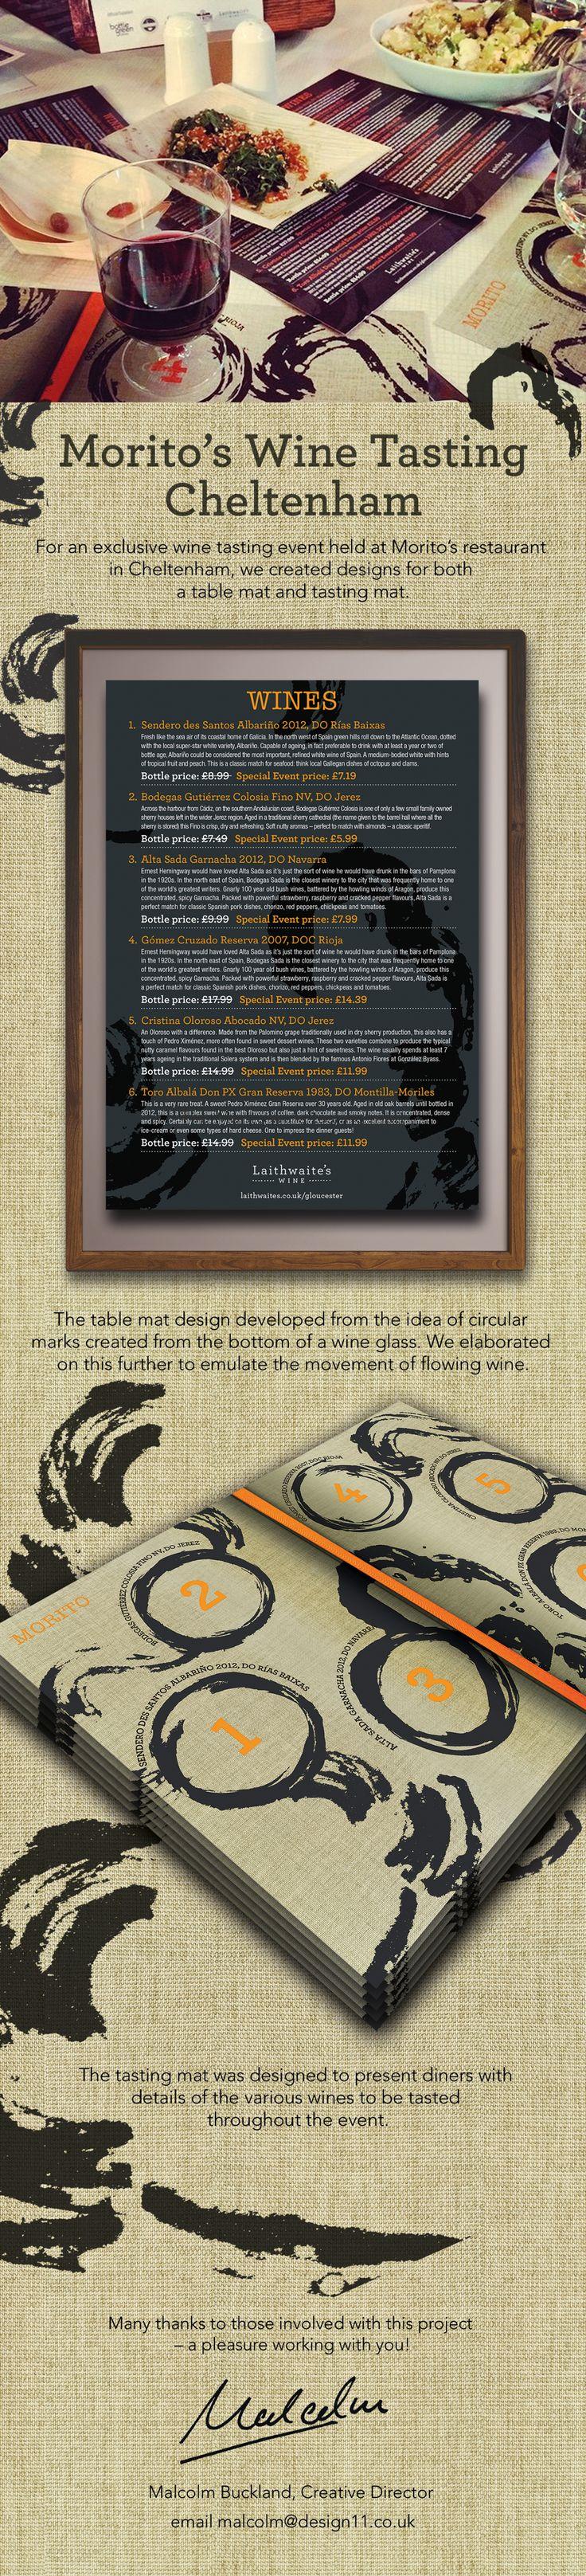 Design Eleven on Behance